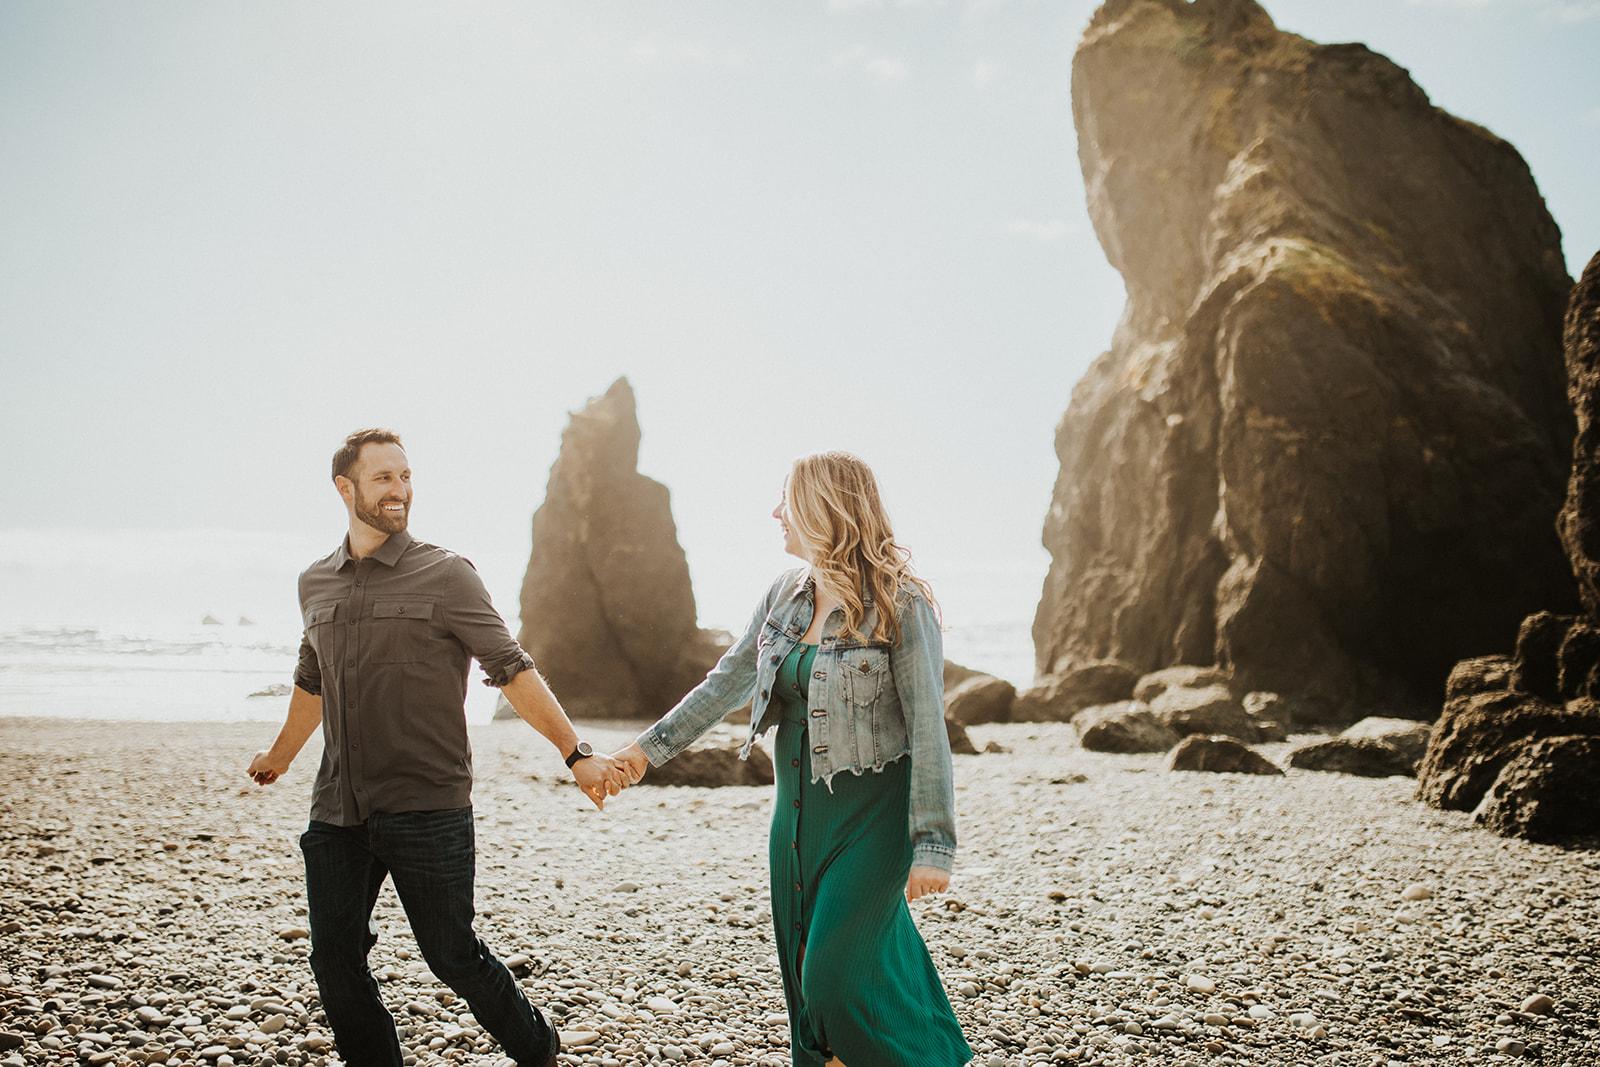 Ruby Beach Engagement Session on the Washington Coast | Rosemary & Pine Photography